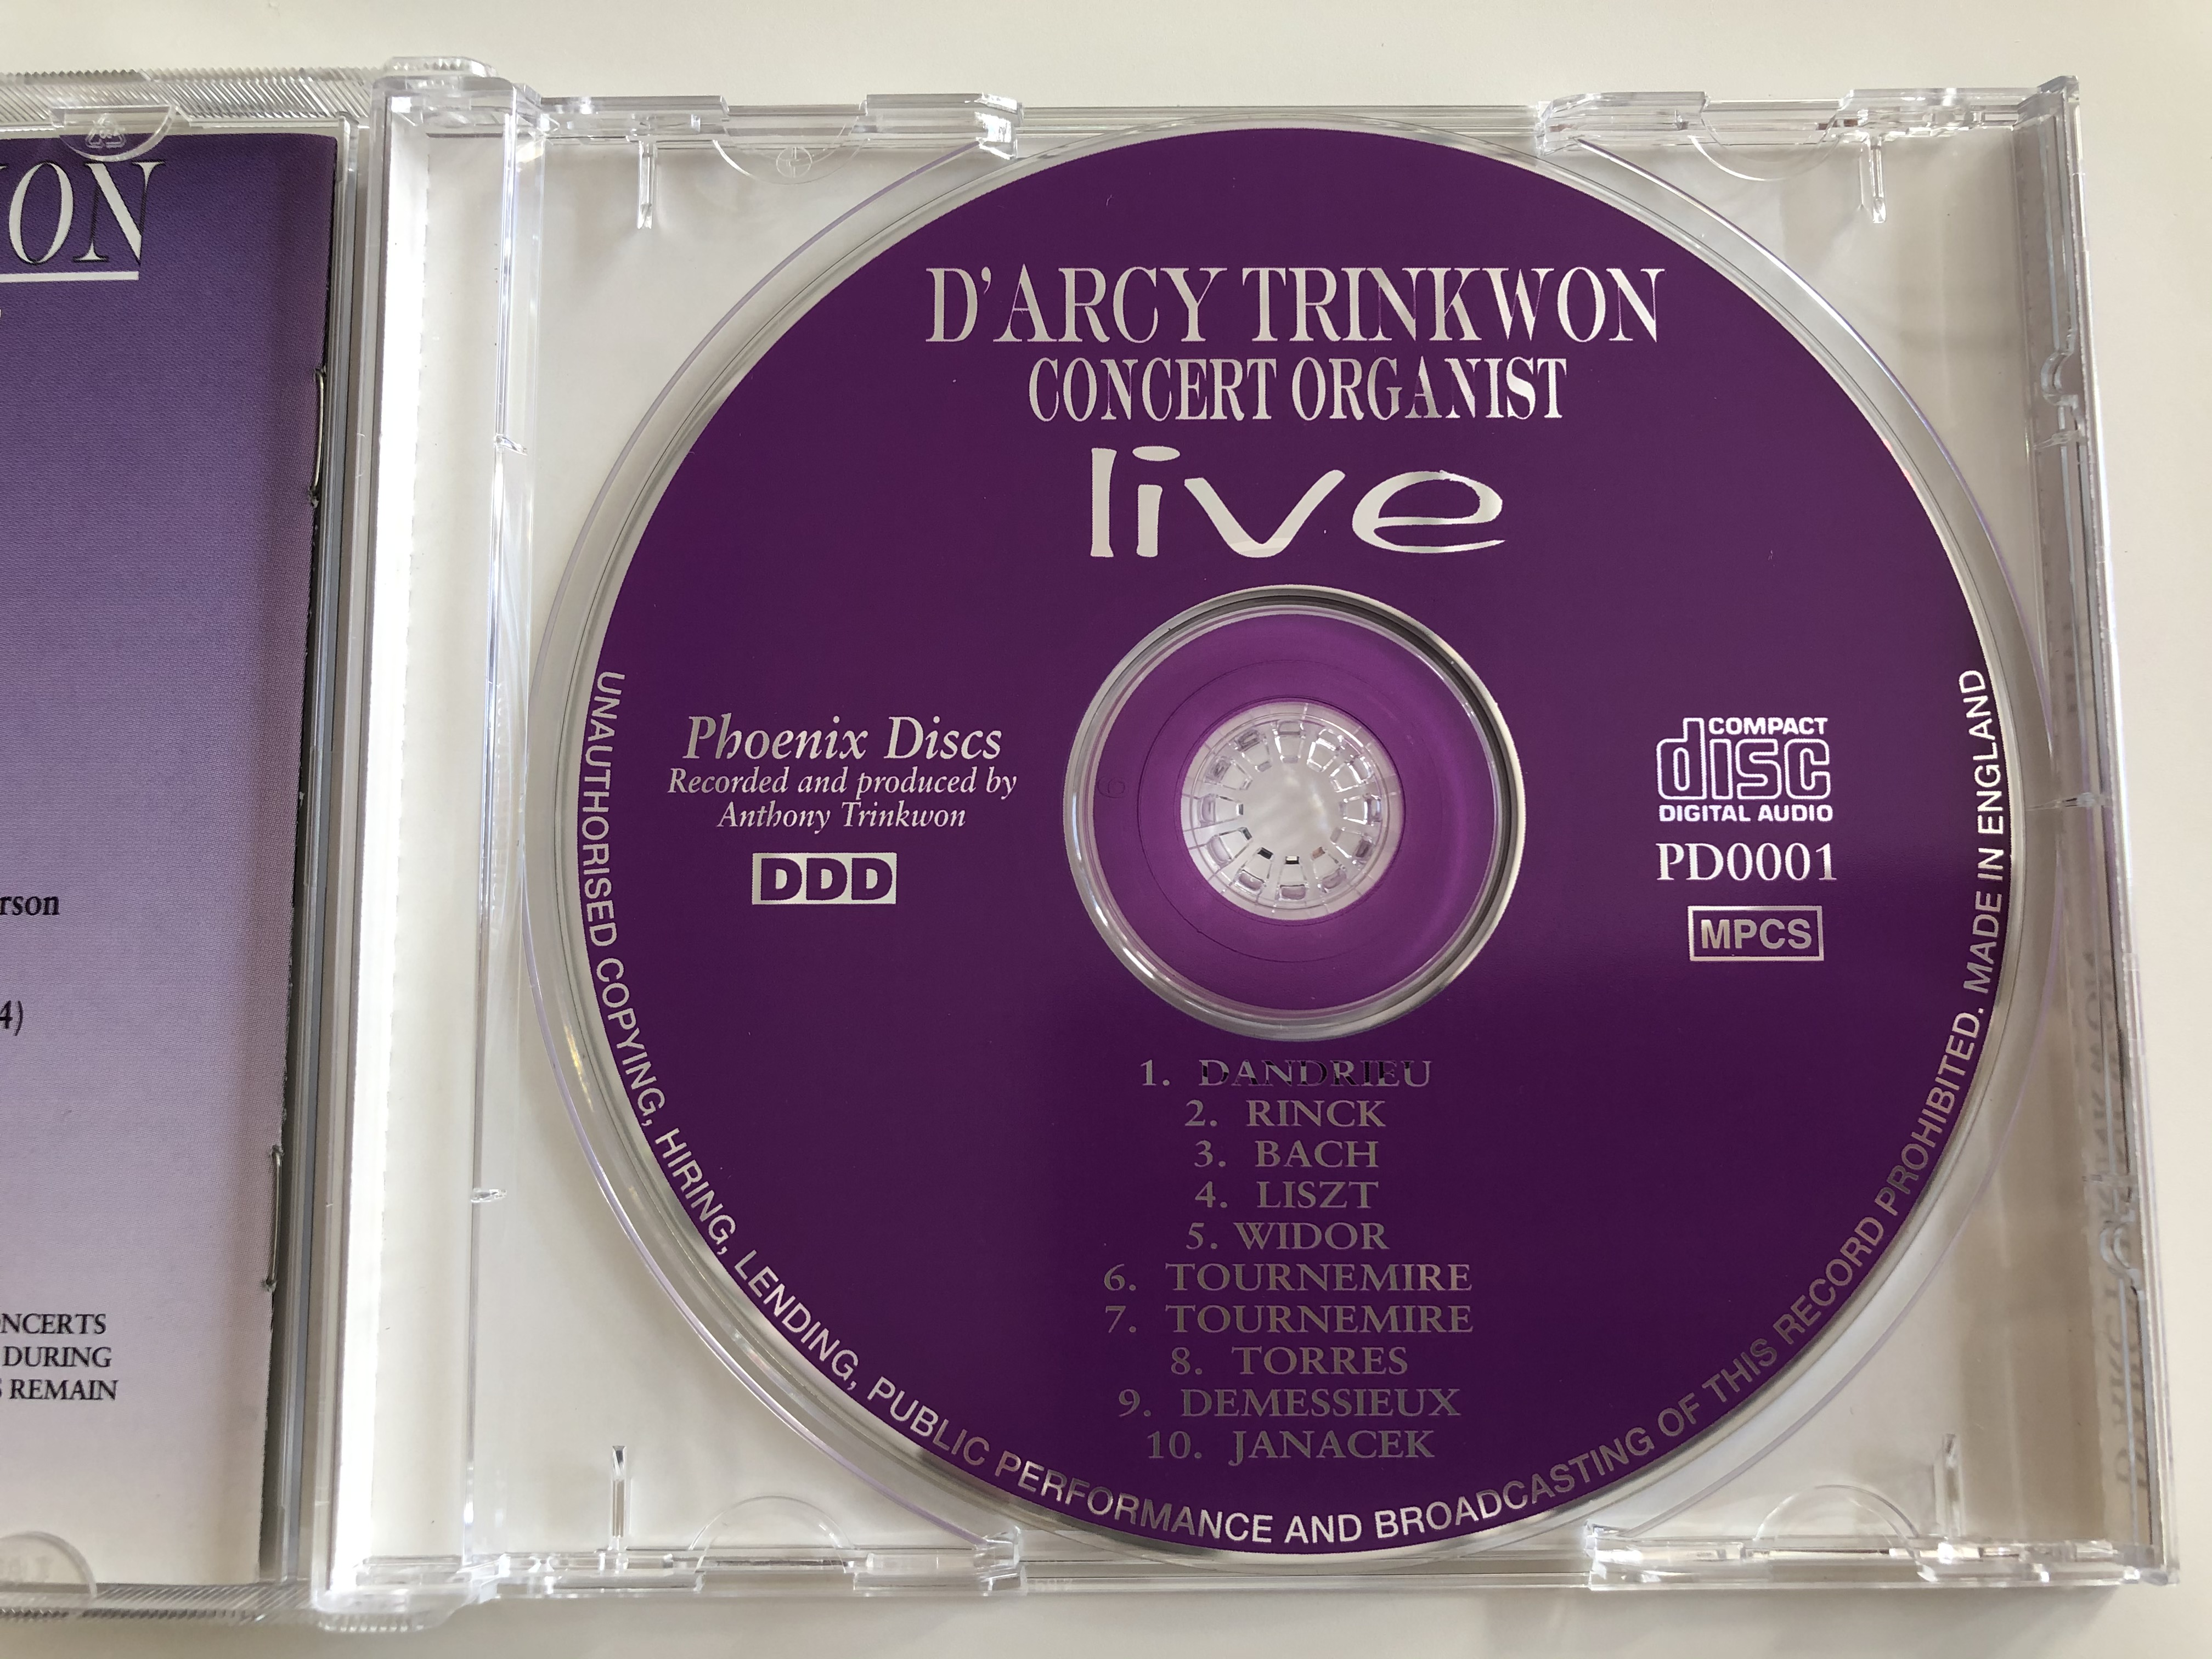 d-arcy-trinkwon-concert-organist-live-phoenix-discs-audio-cd-stereo-pd-0001-6-.jpg